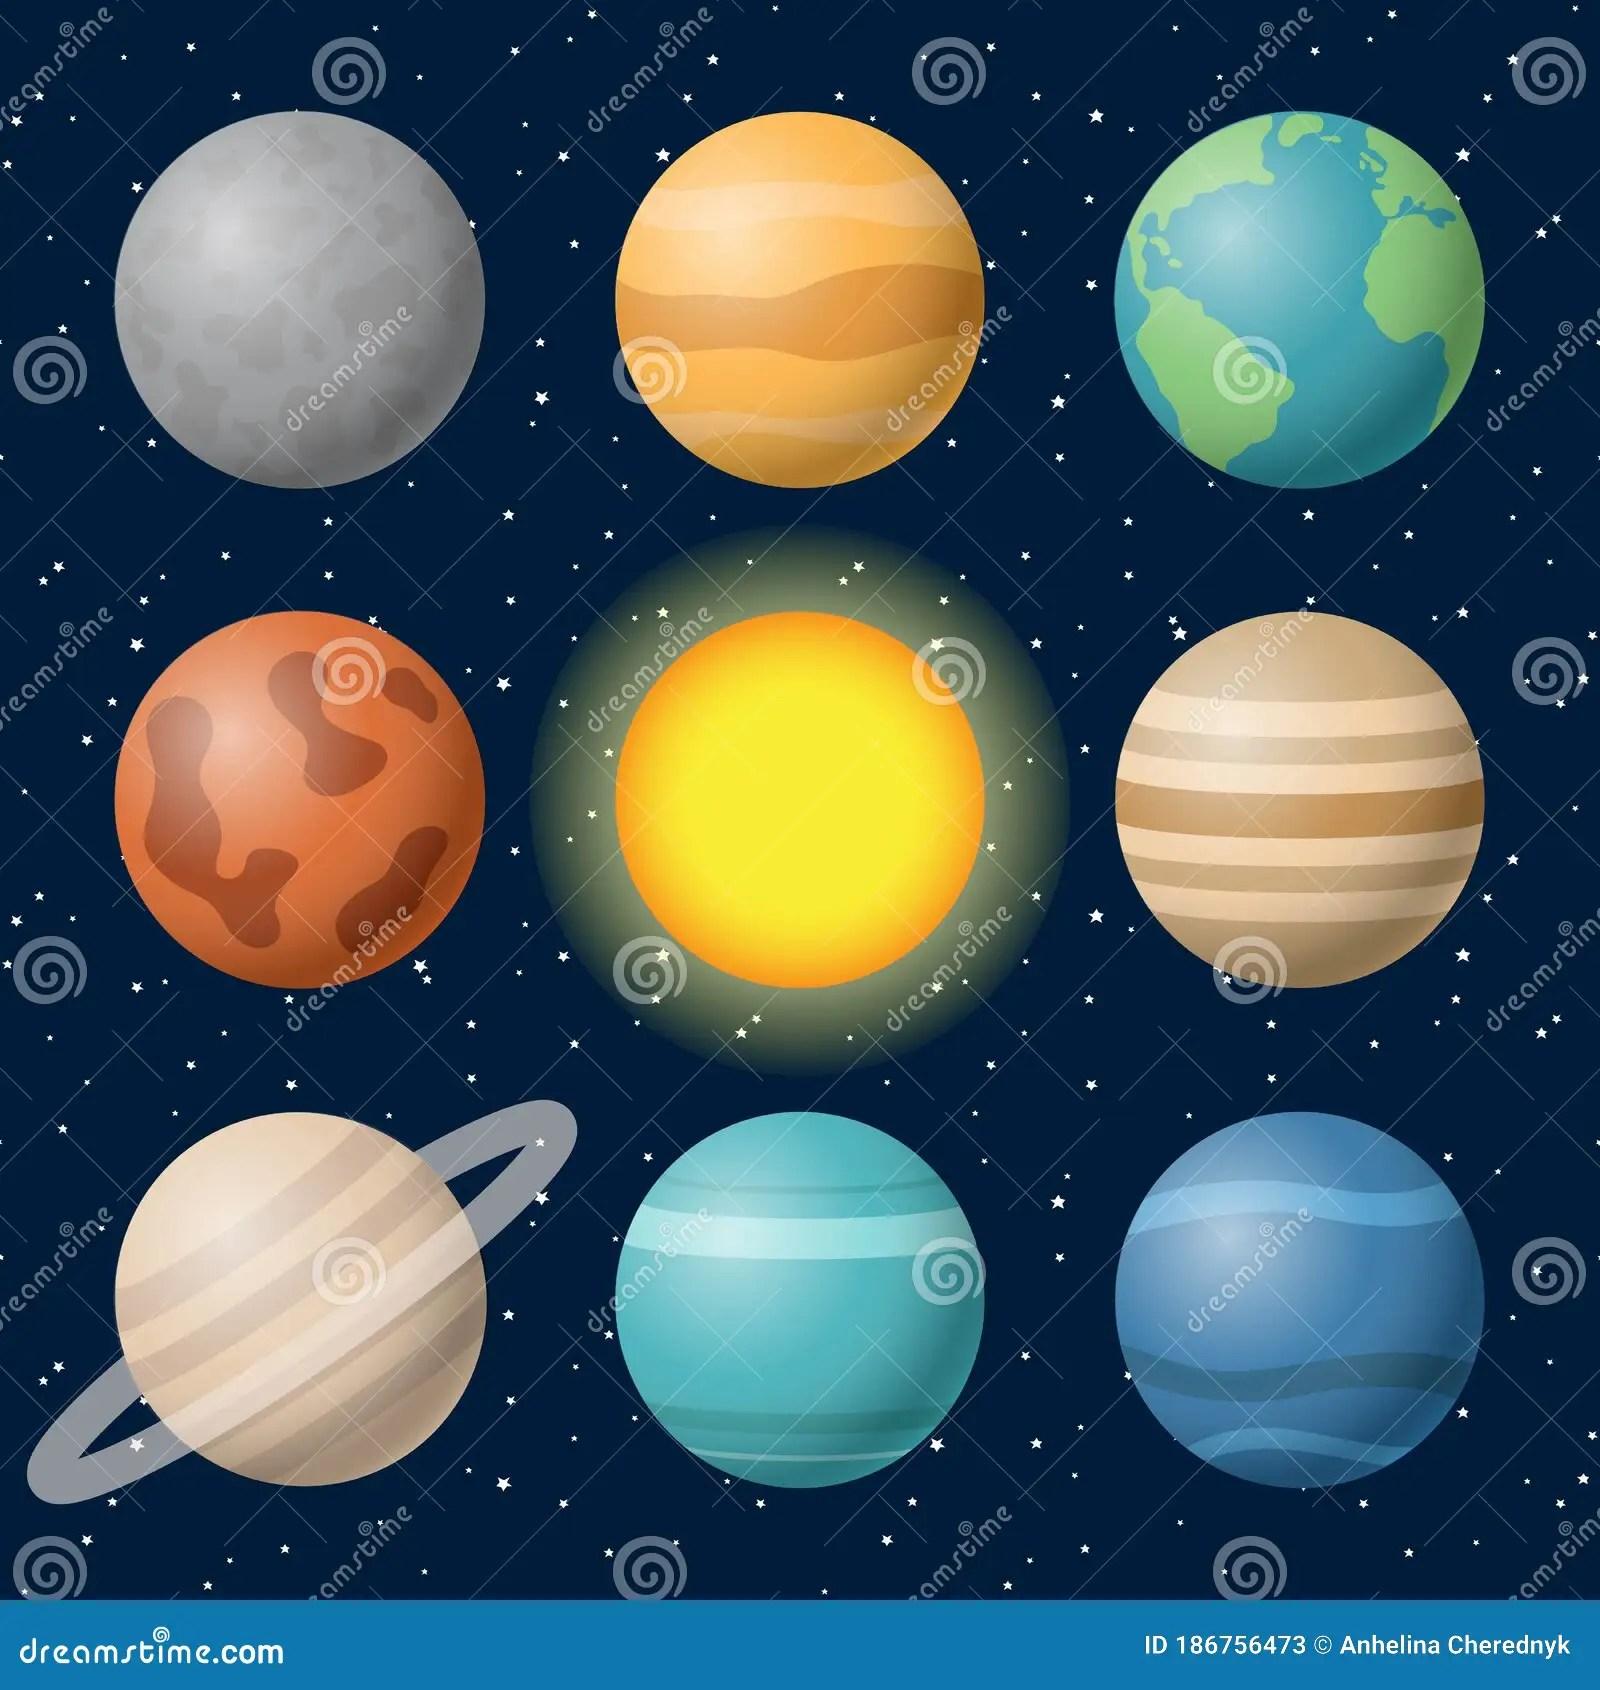 Planets Of The Solar System Mercury Venus Earth Mars